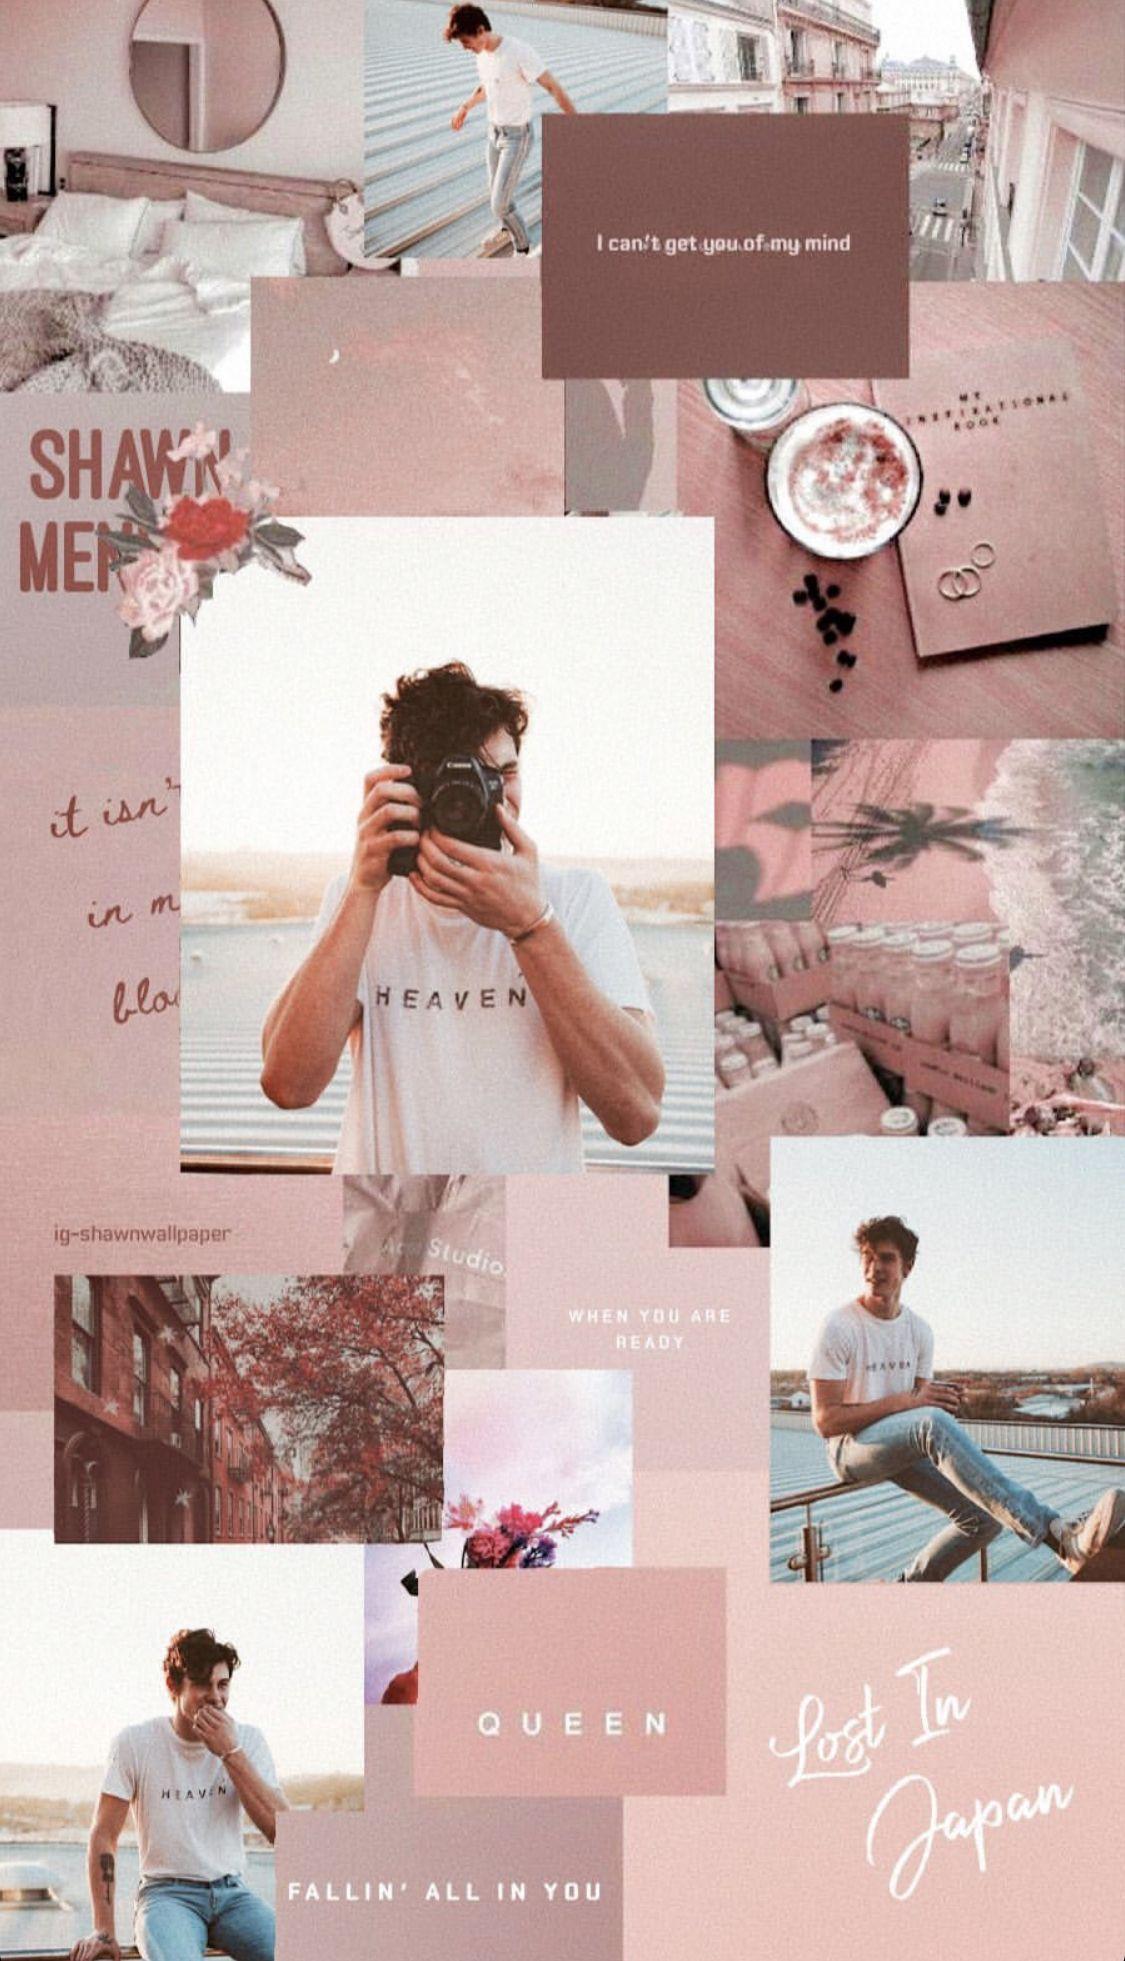 Shawn Wallpapers Shawnwallpaper Instagram Photos And Videos Shawn Mendes Wallpaper Shawn Mendes Lockscreen Shawn Mendes